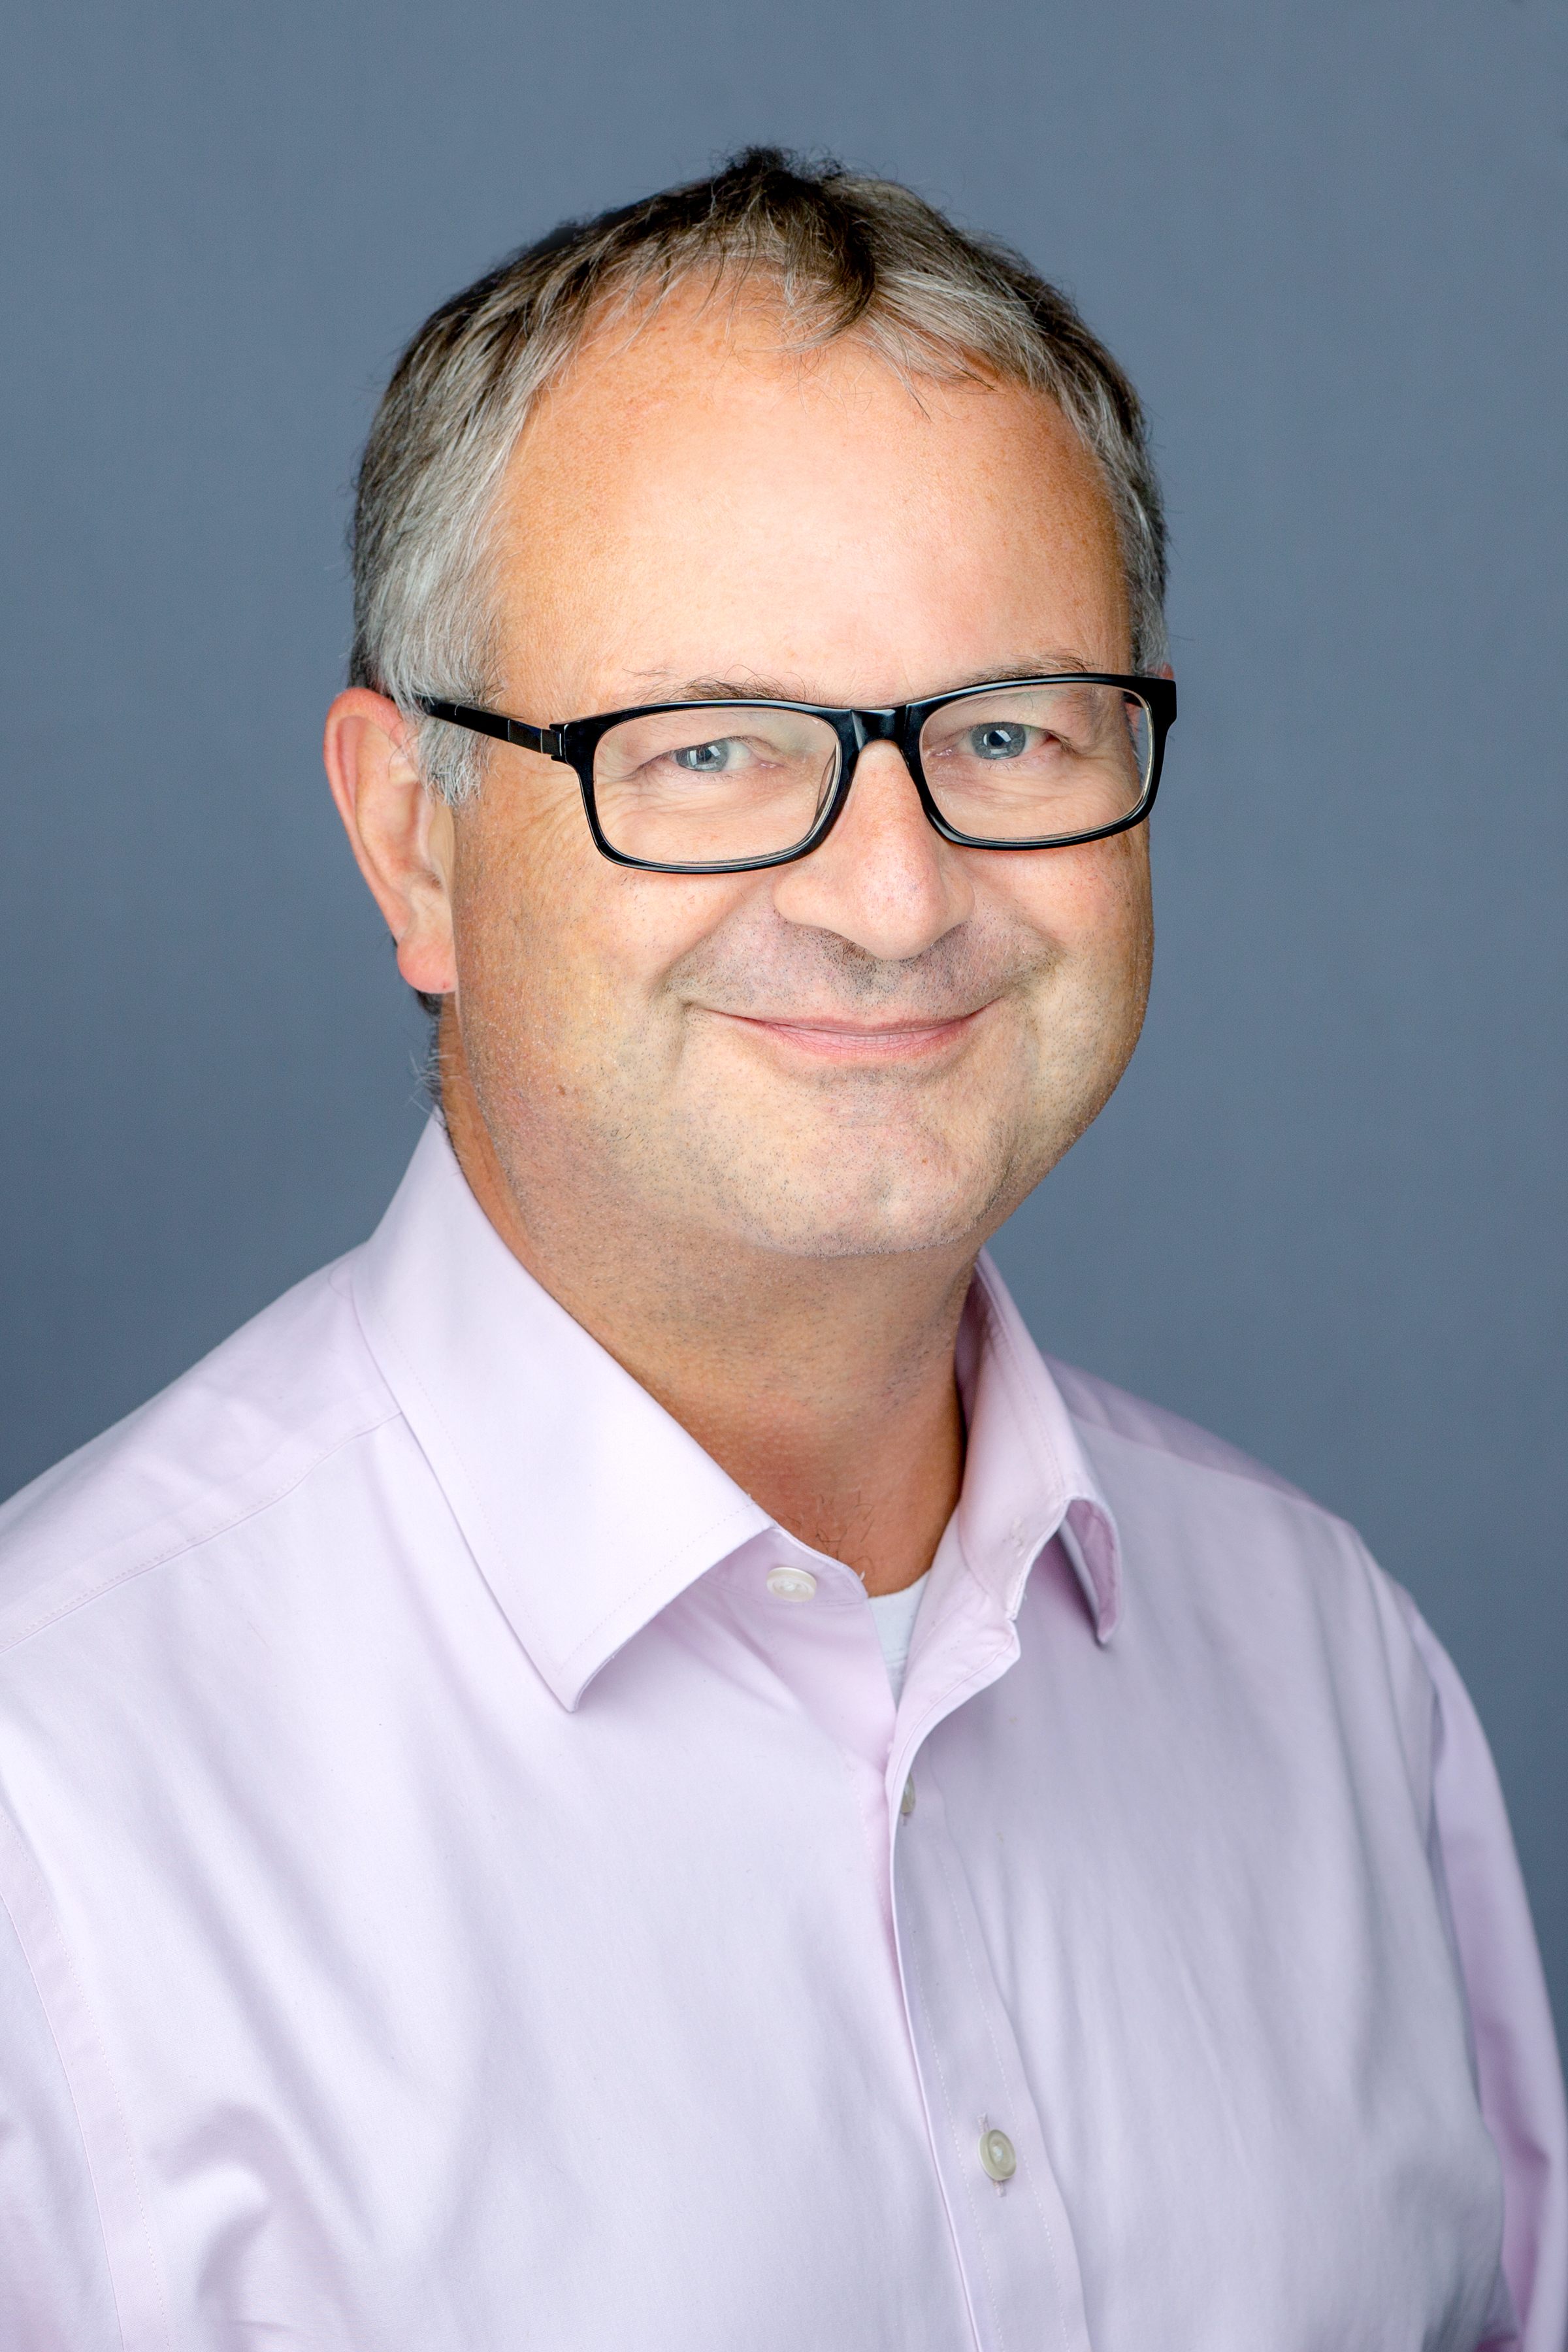 Head Shot of Tim Houstoun - CEO Global Shares